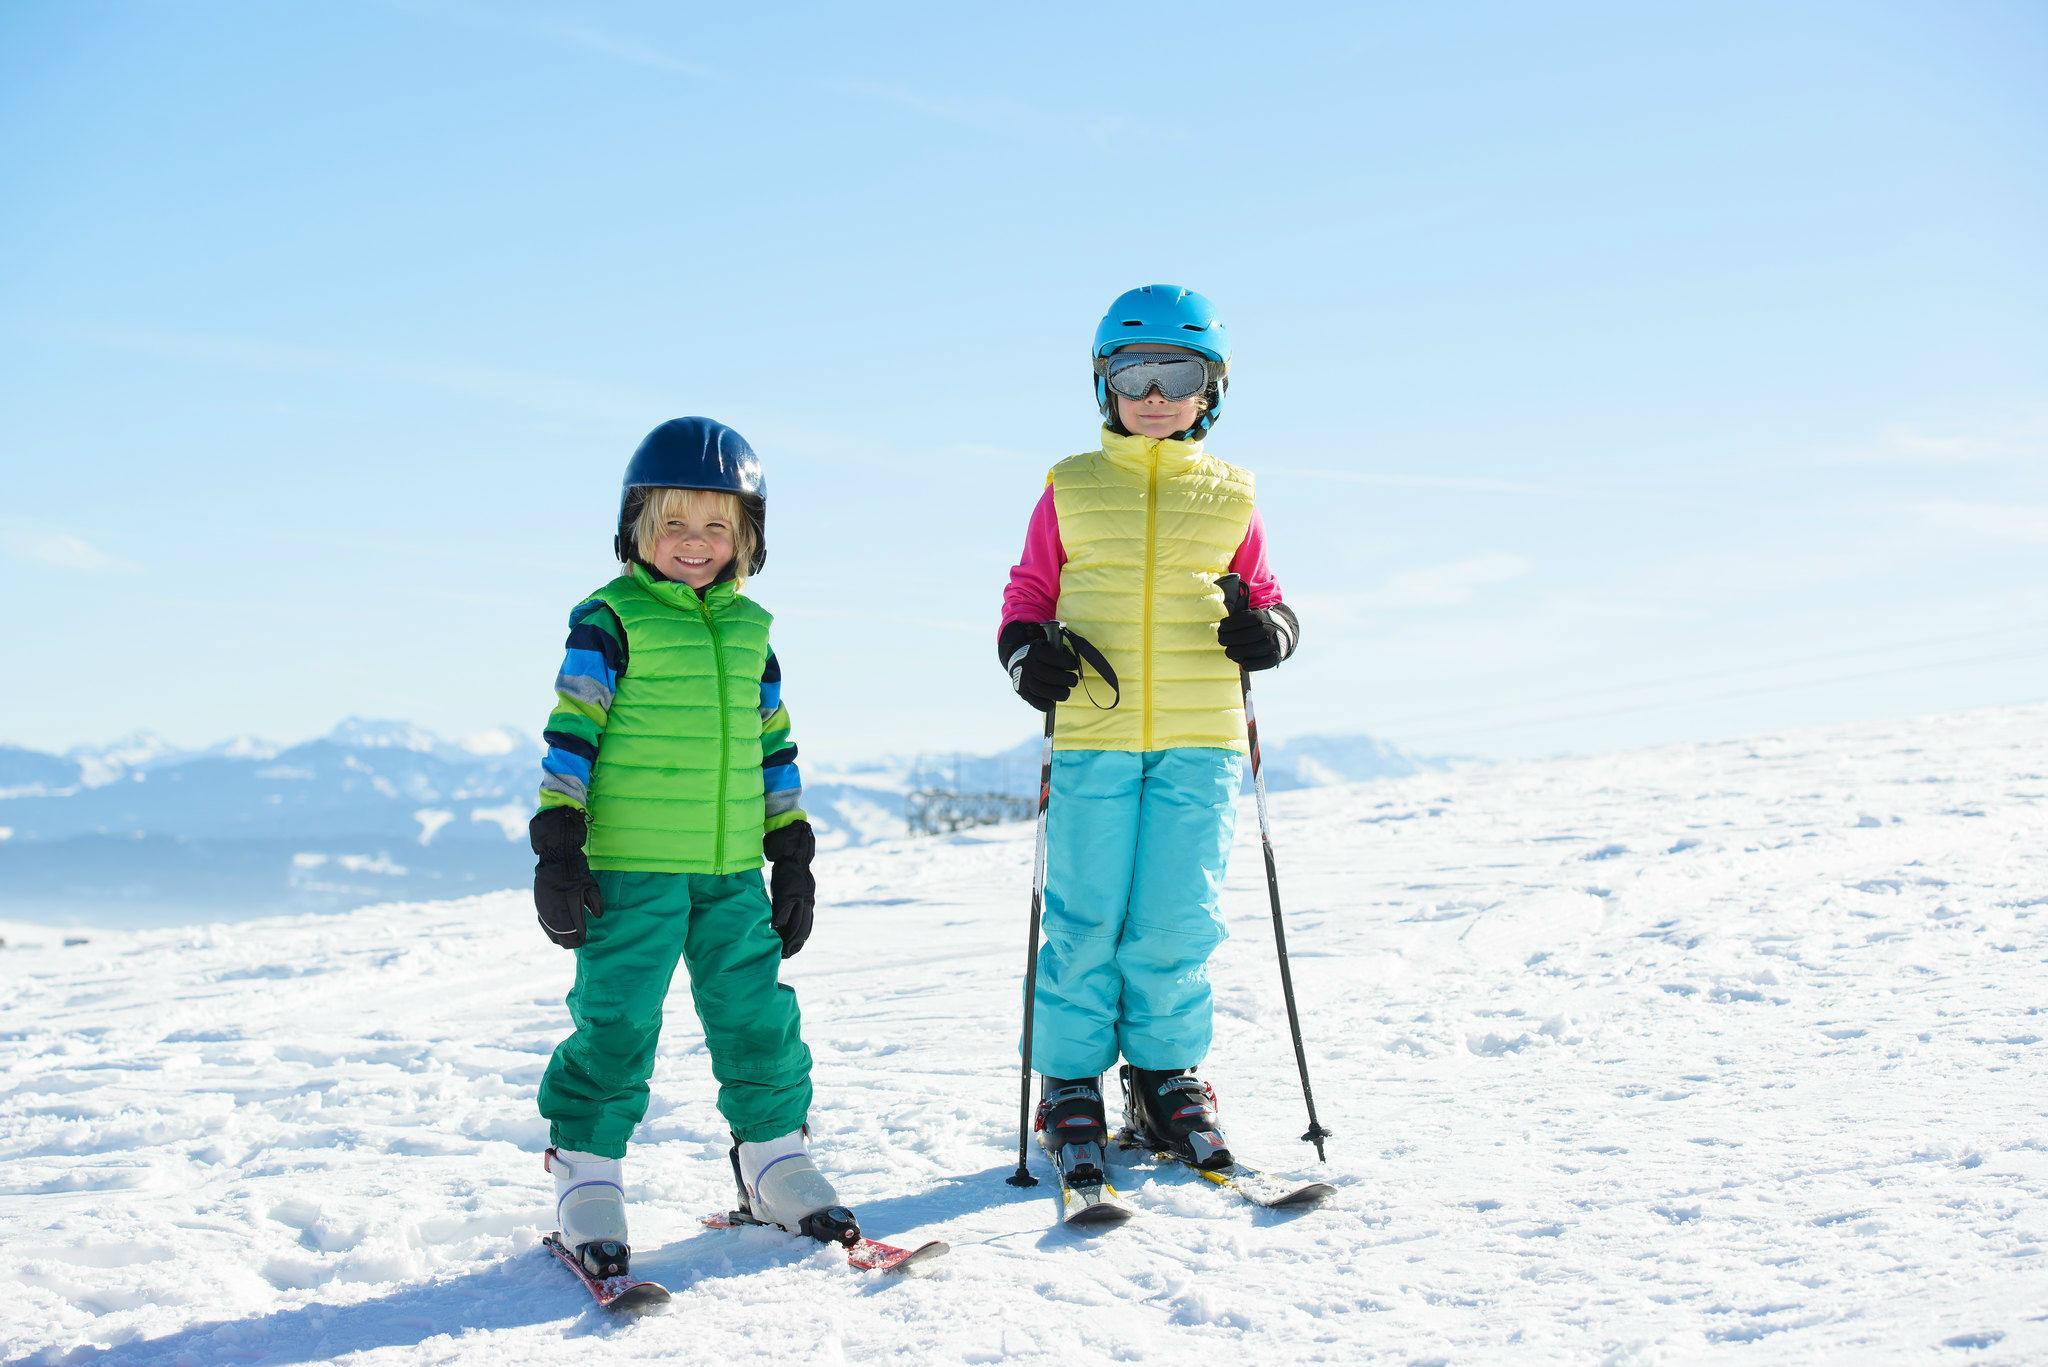 Privélessen skiën voor kinderen in Kaltenbach